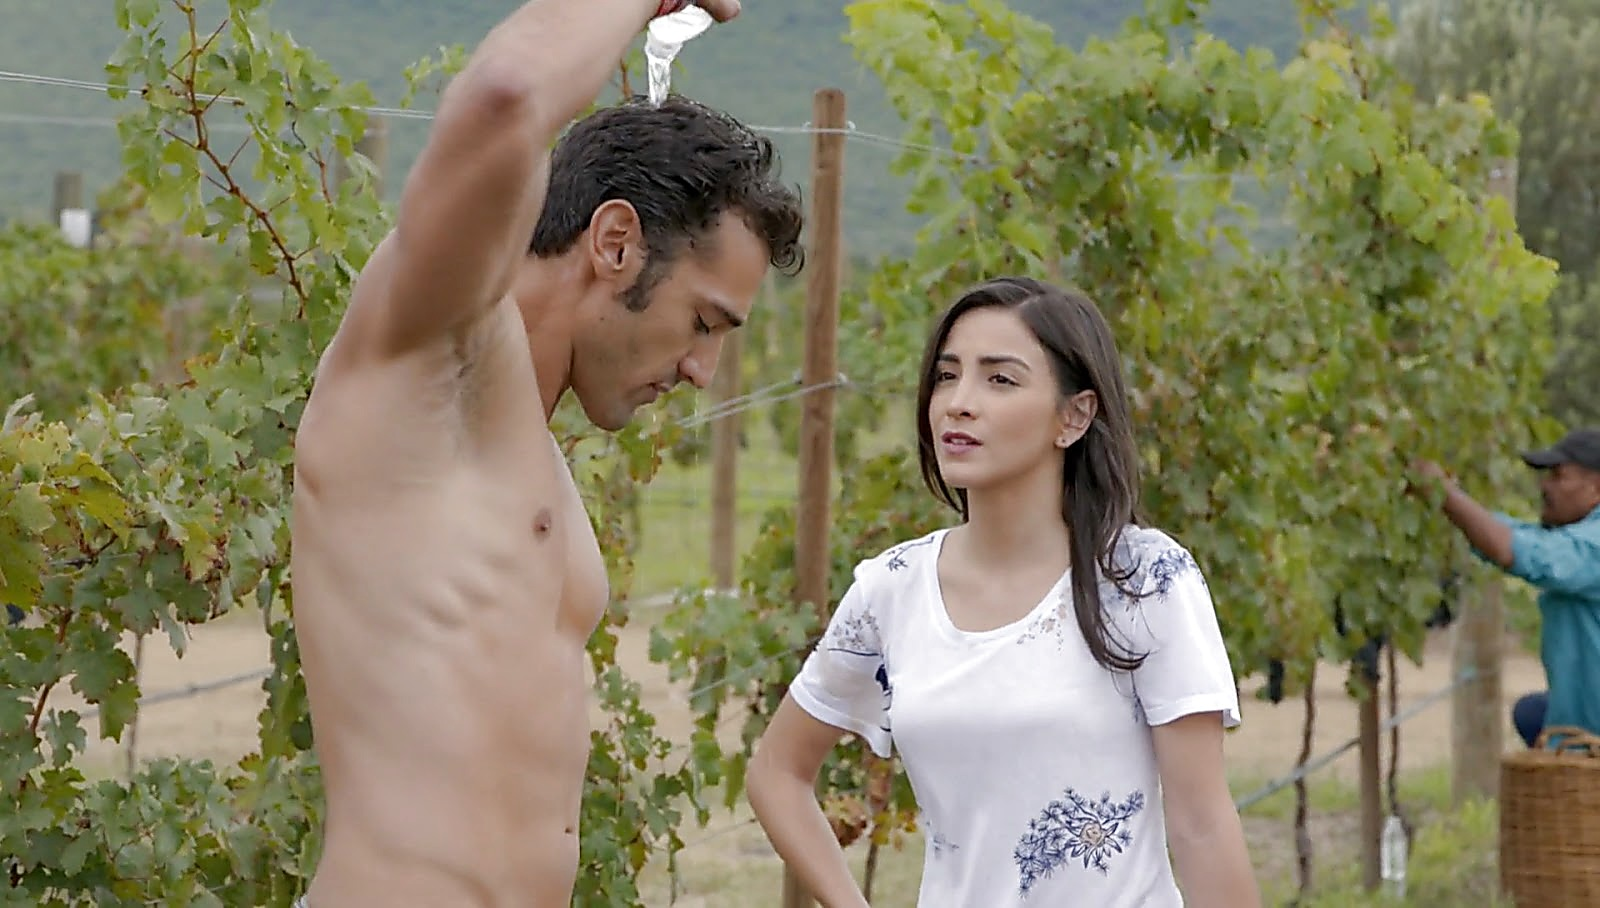 Gabriel Soto sexy shirtless scene January 29, 2017, 12pm